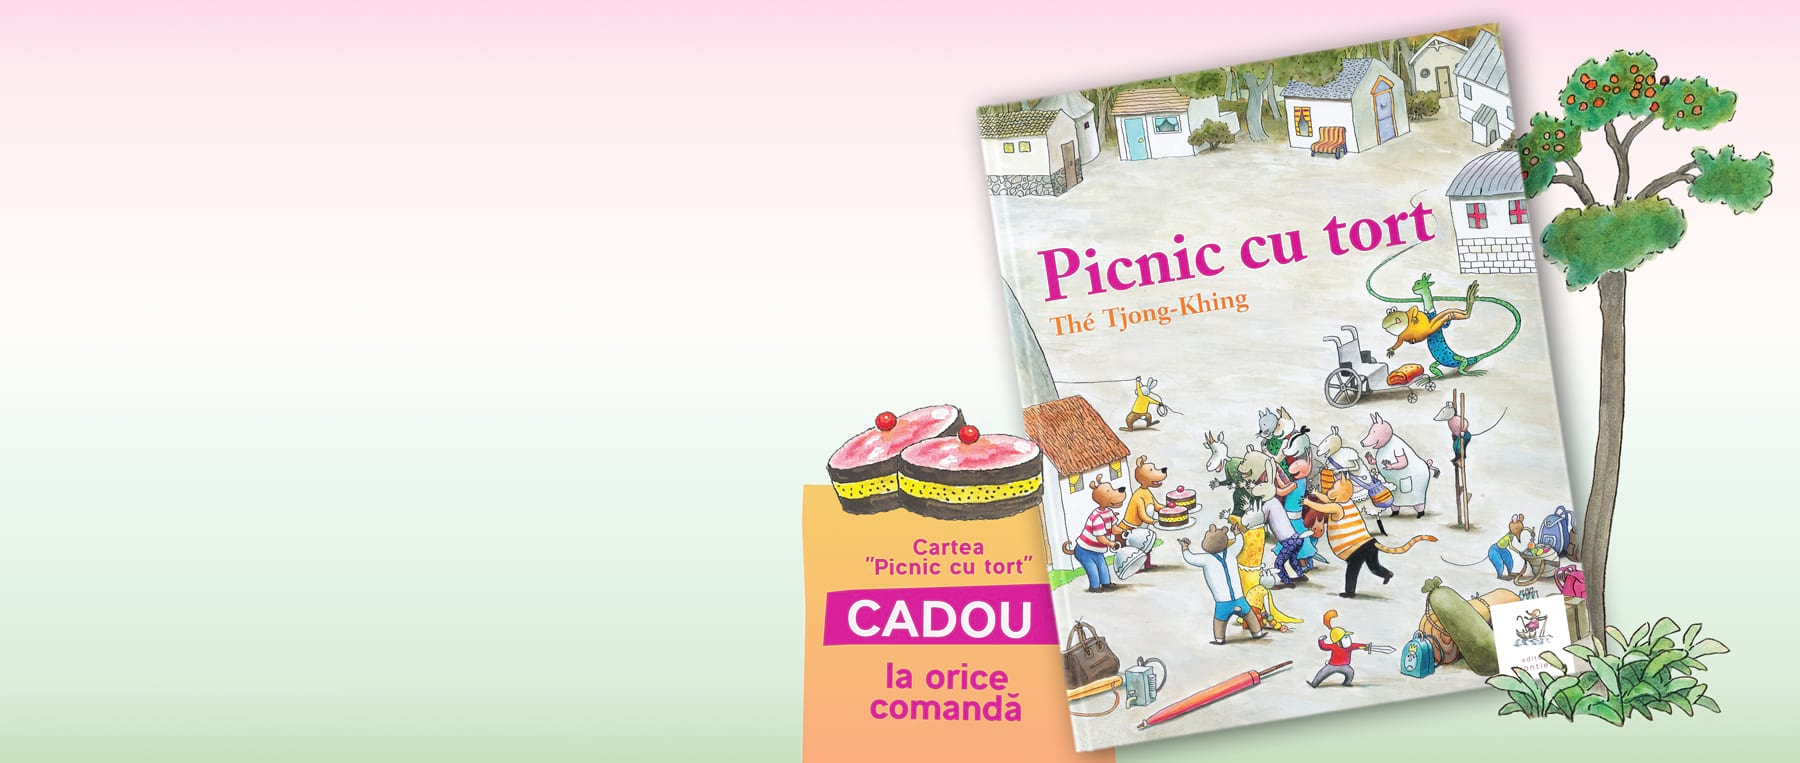 Picnic-cu-tort_desktop-banner_carte_cadou